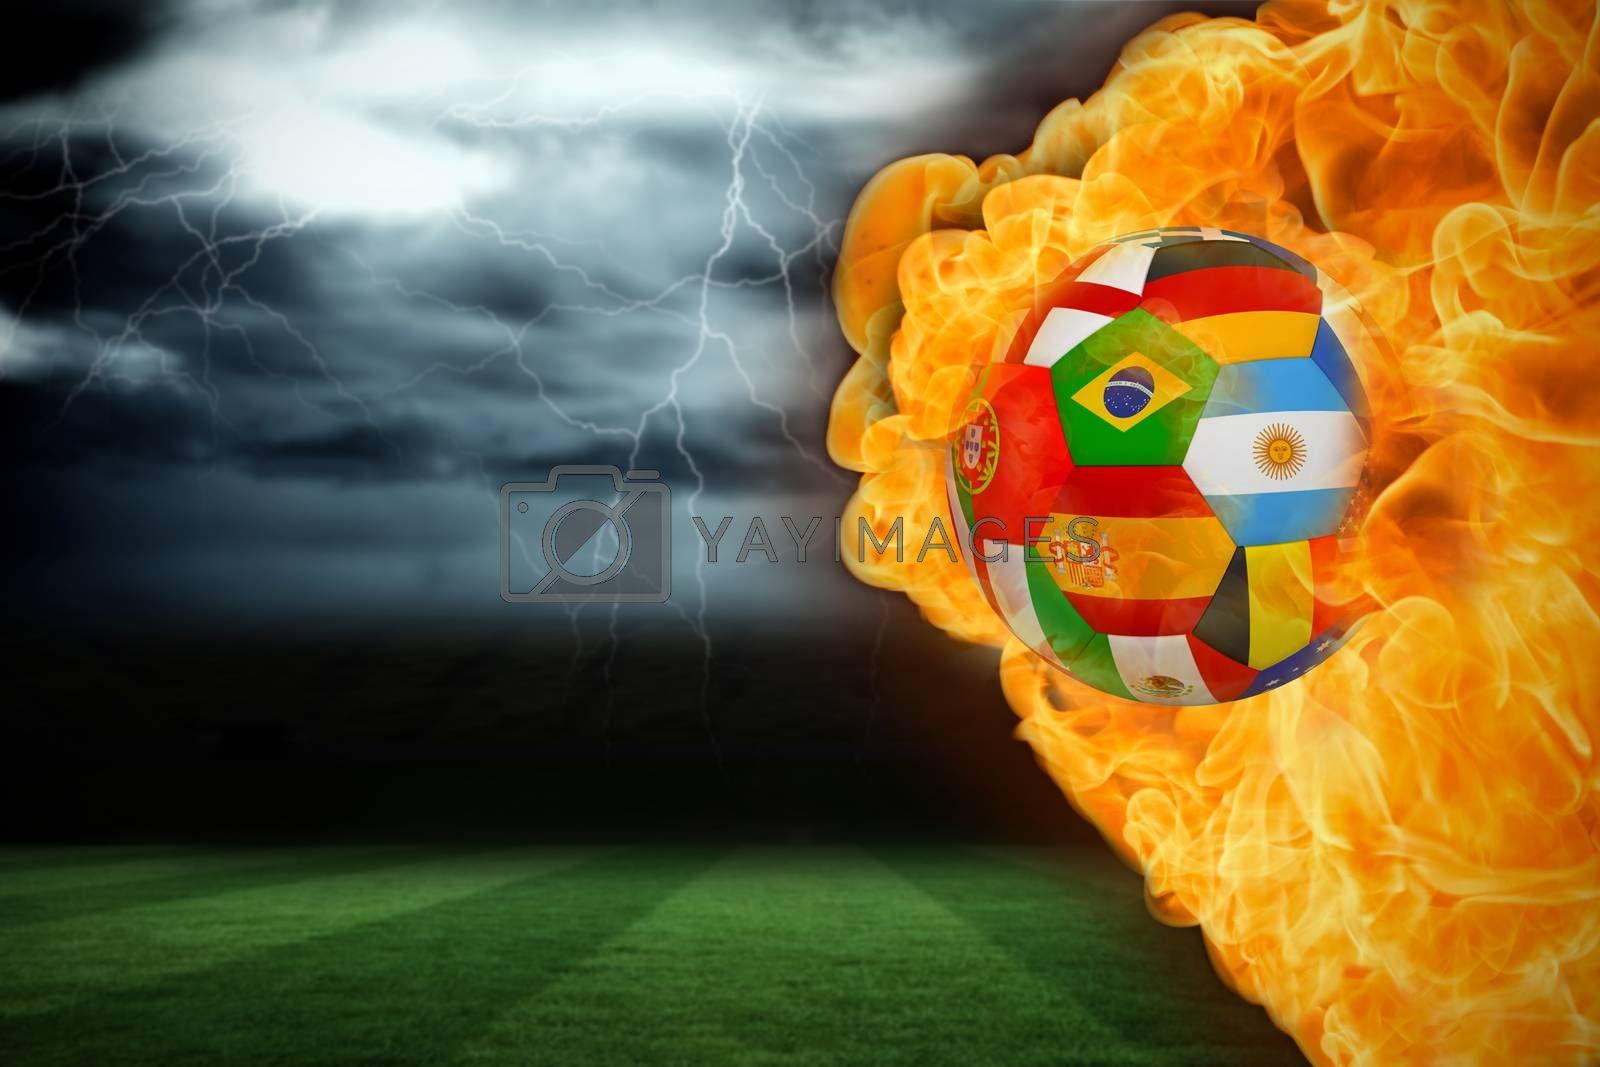 Fire surrounding international flag football by Wavebreakmedia